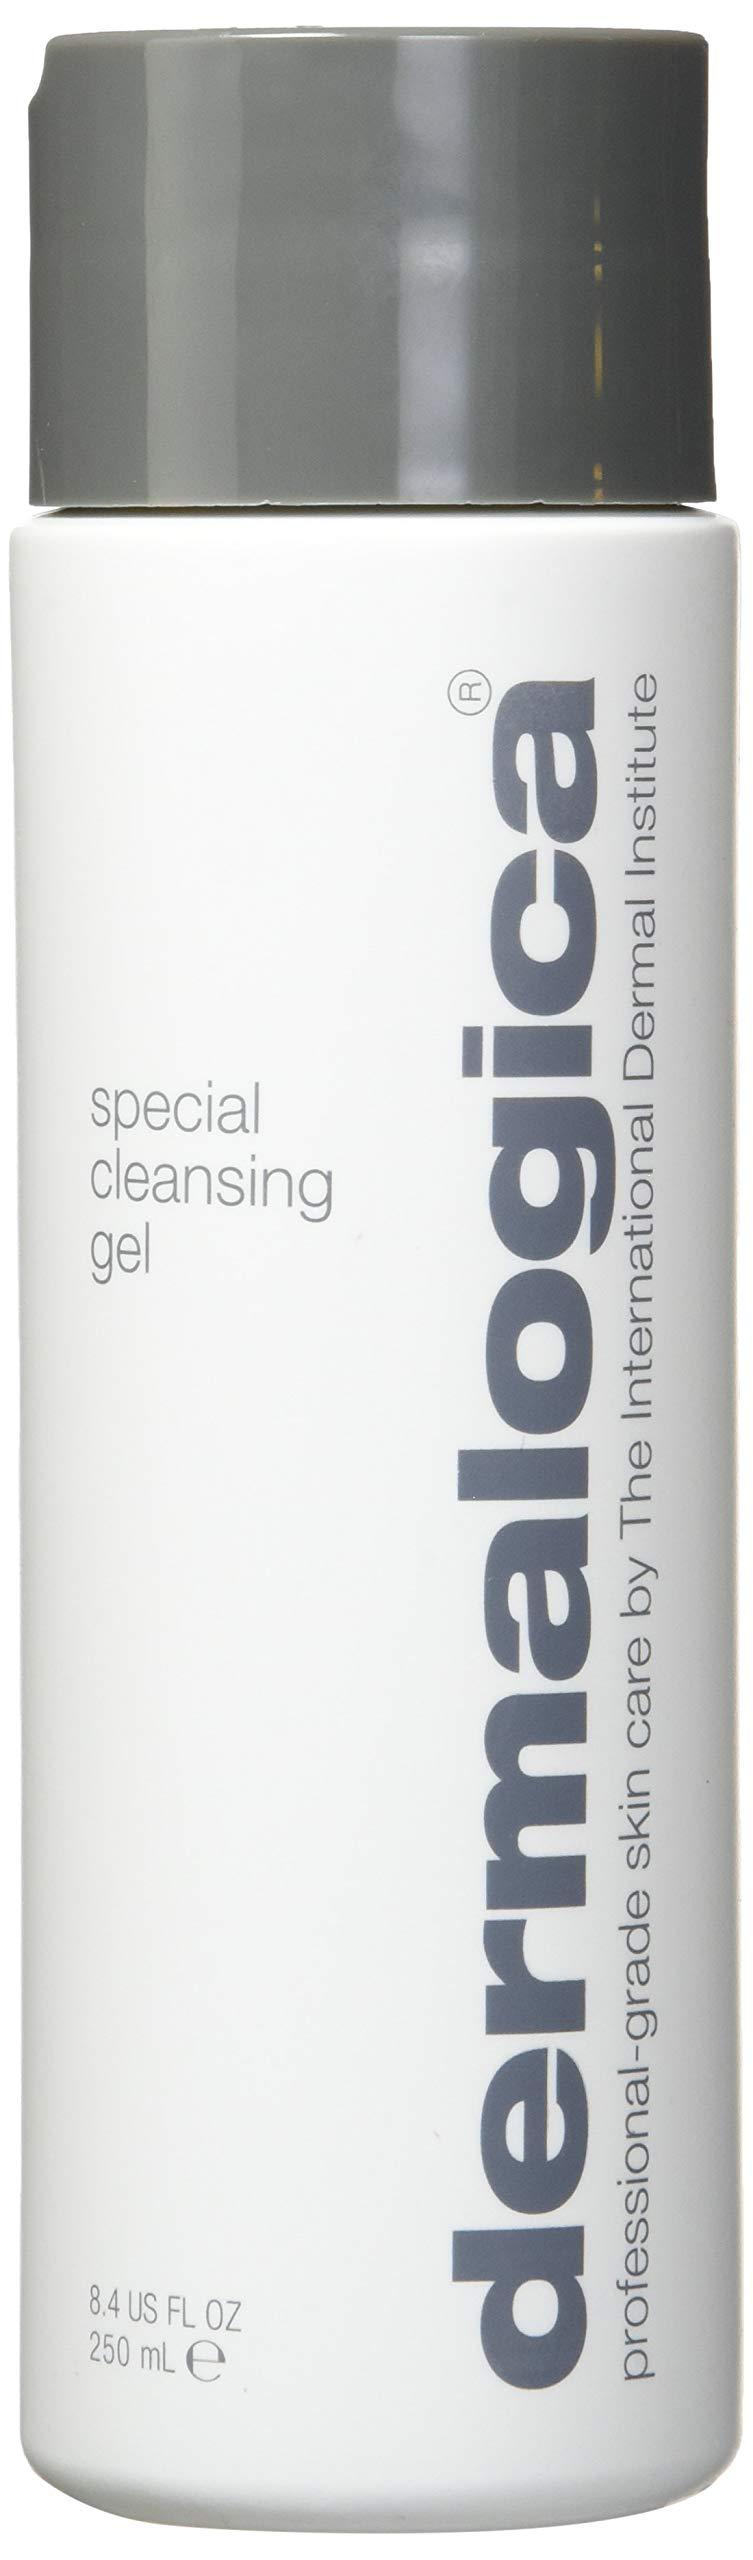 Dermalogica Special cleansing gel, 8.4 oz by DERMALOGICA